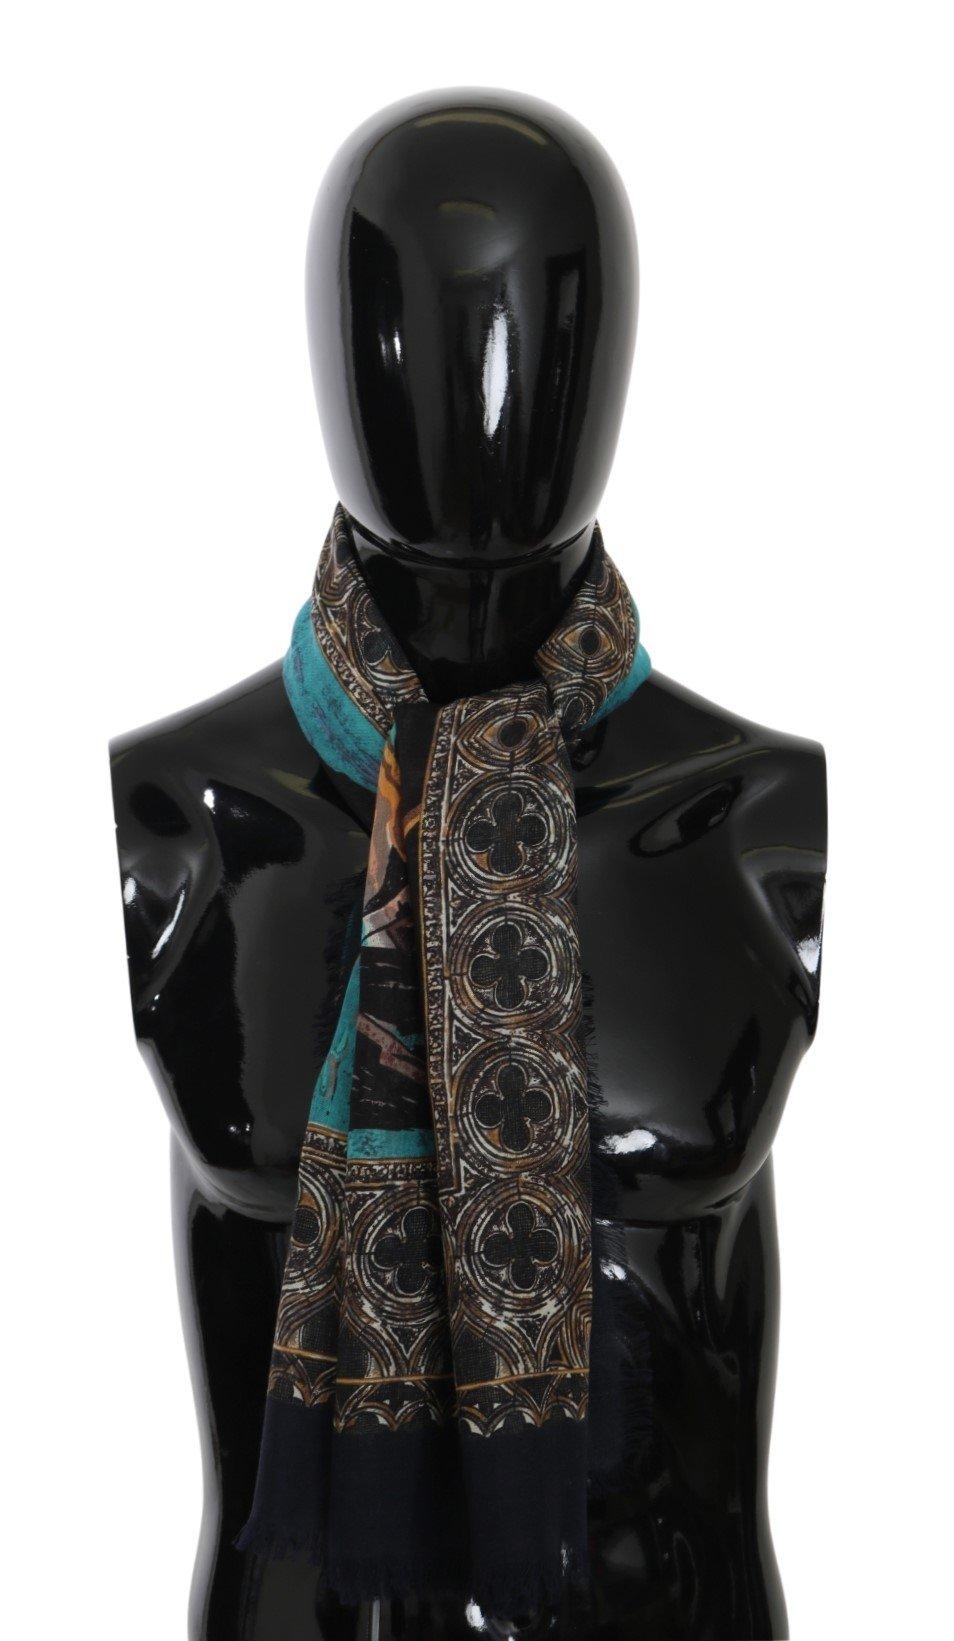 Dolce & Gabbana Men's Venice Wrap Cashmere Scarf Multicolor MS5527